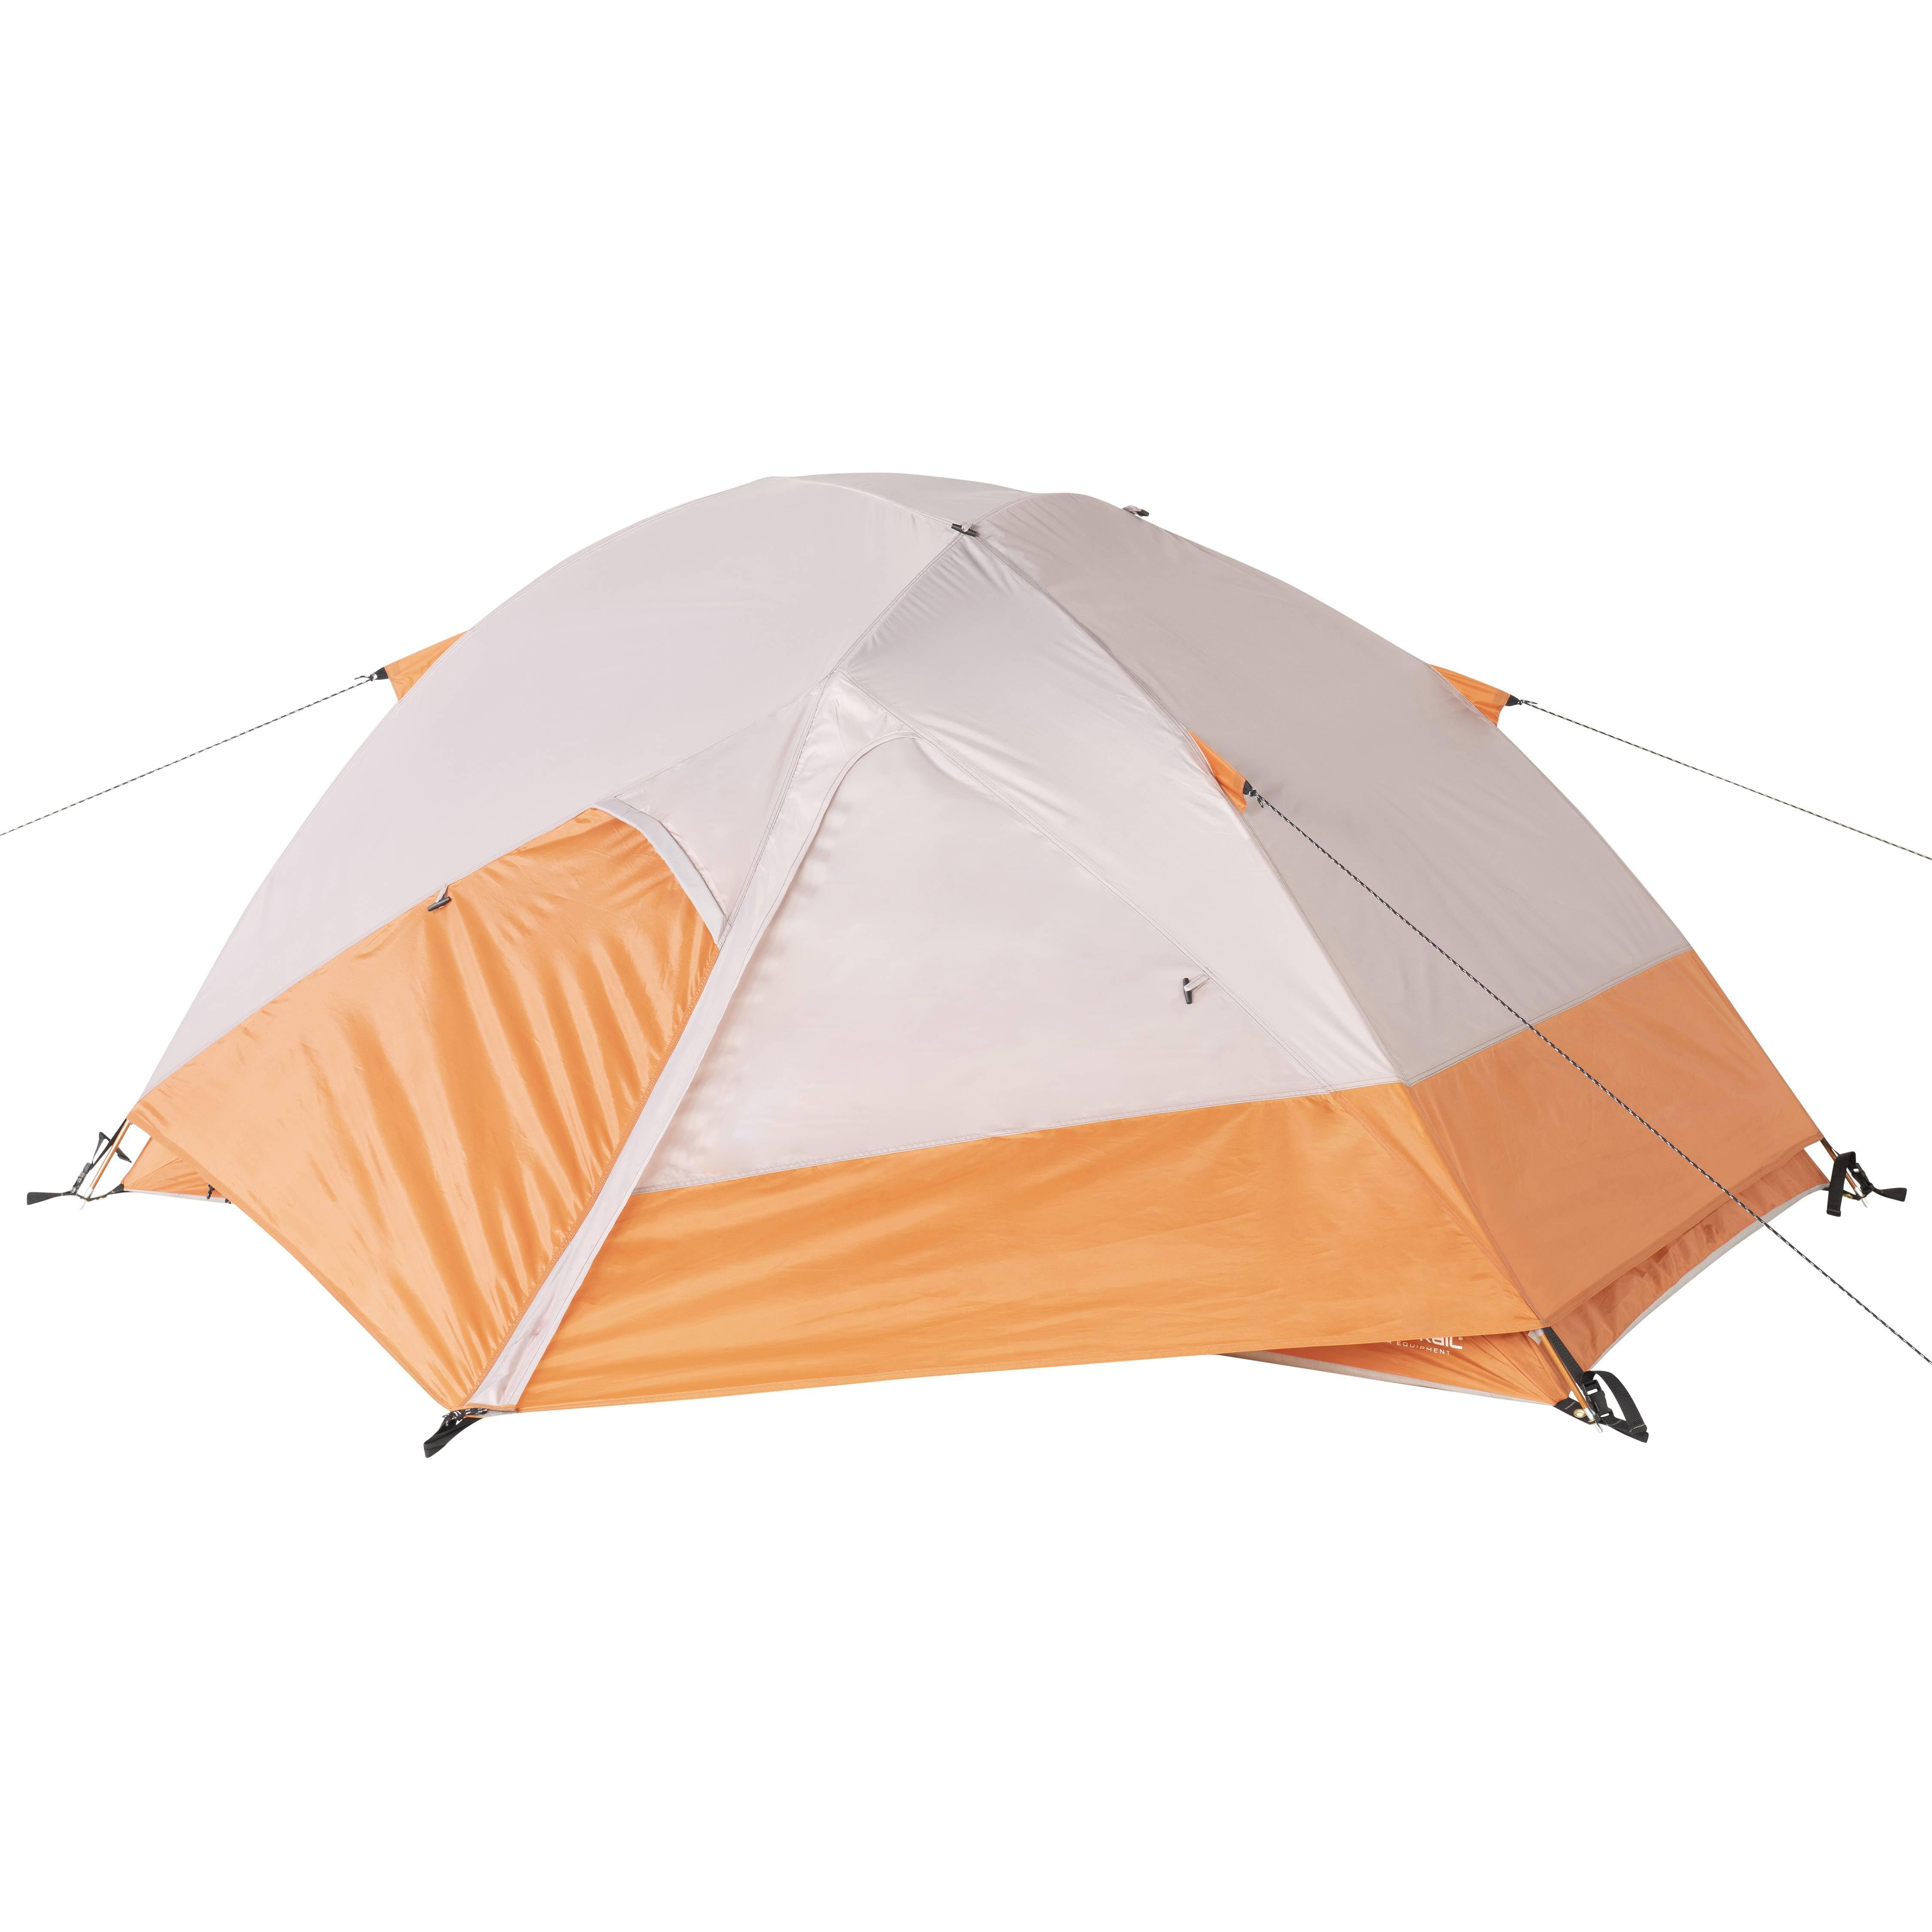 Ozark Trail 2-Person 4-Season Tent with 2 Vestibules and Full Rain Fly Orange